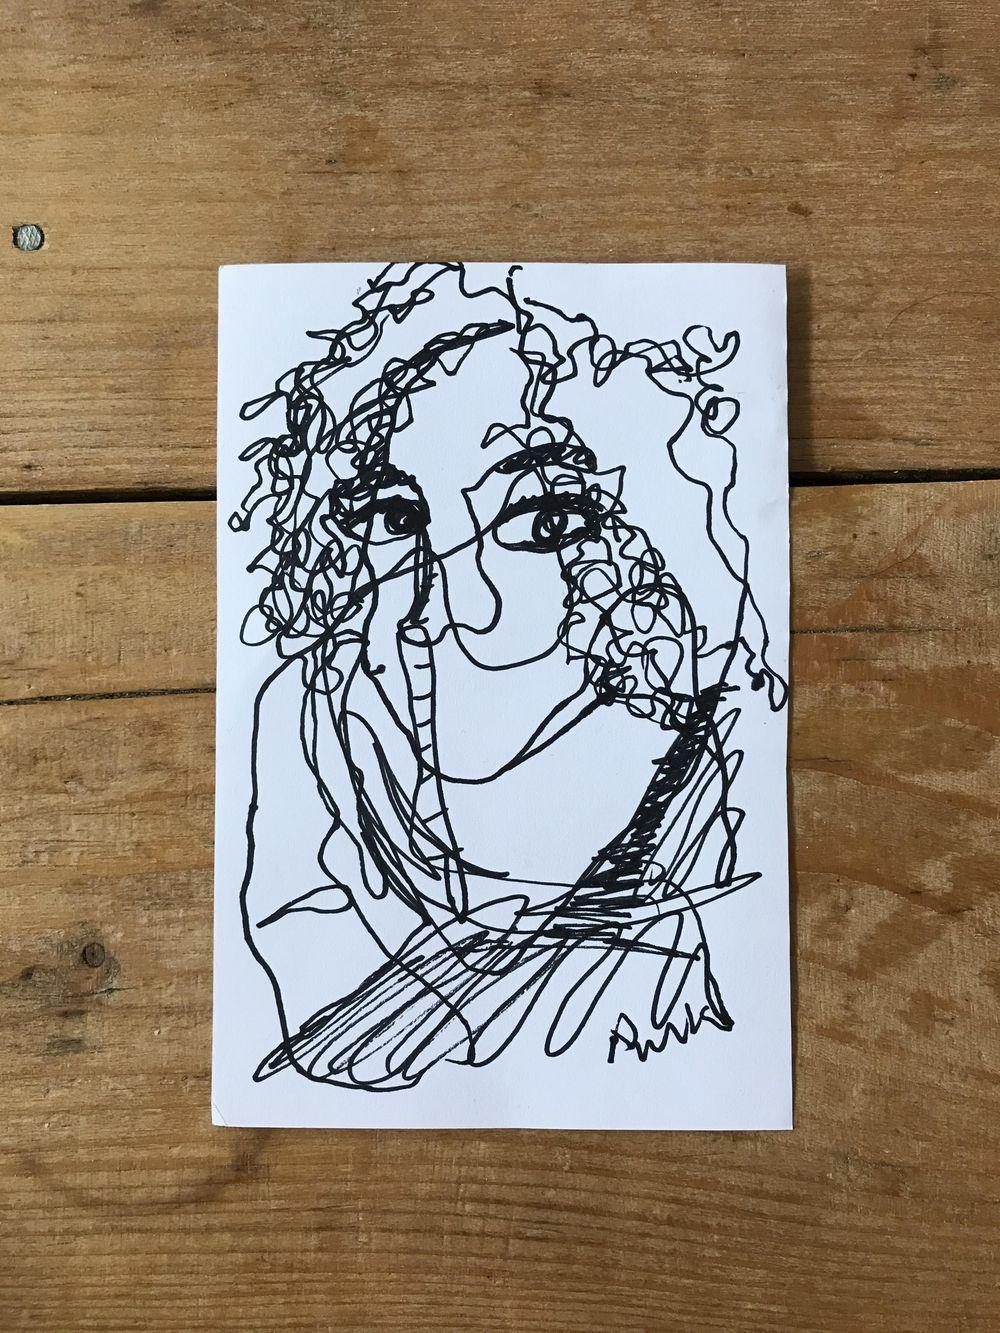 Self portrait - image 2 - student project